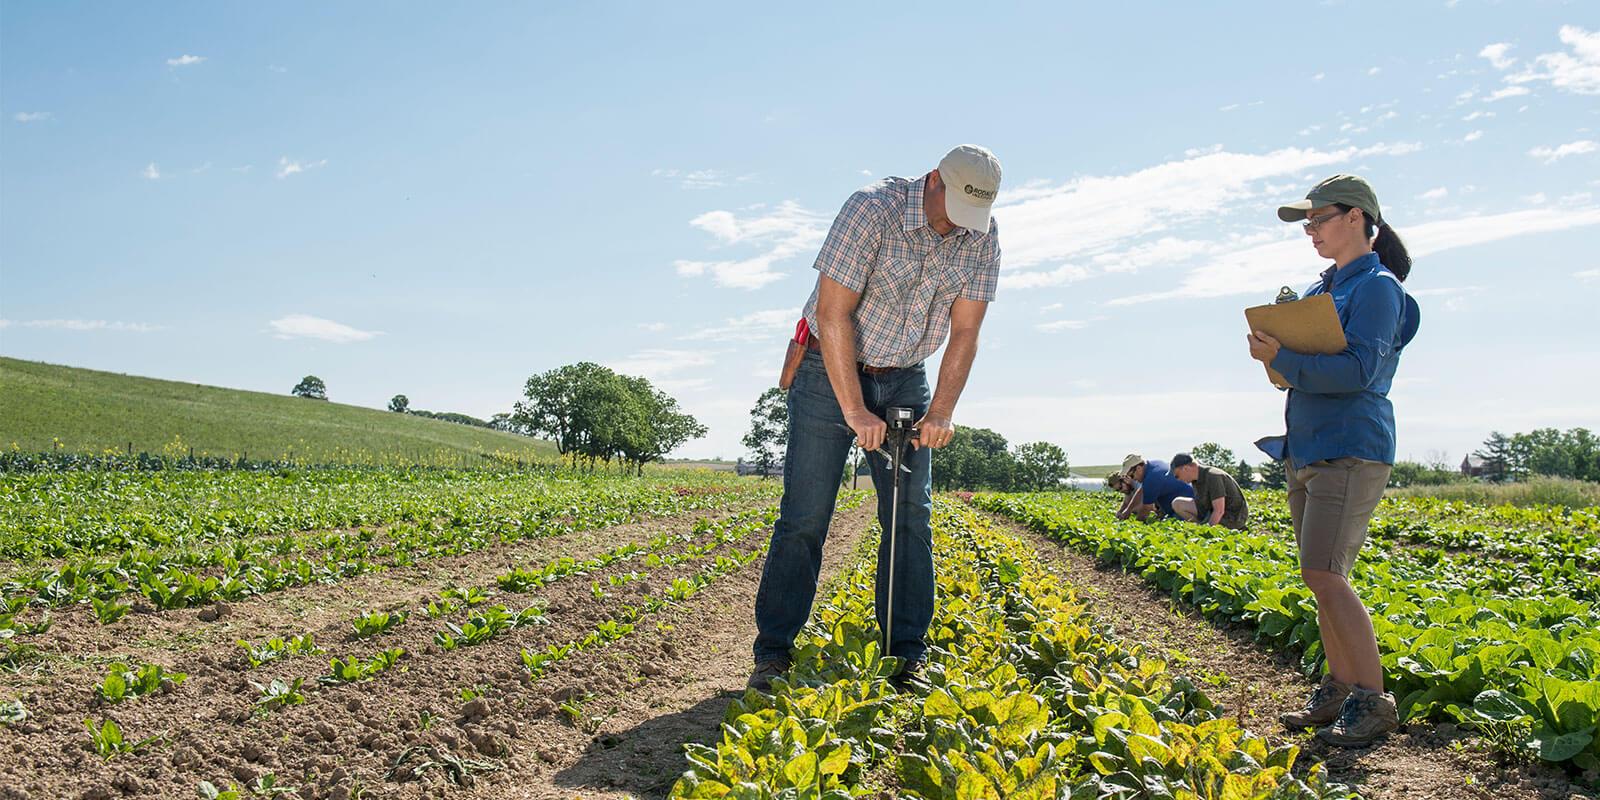 Rodale Institute farmers & researchers working in organic fields